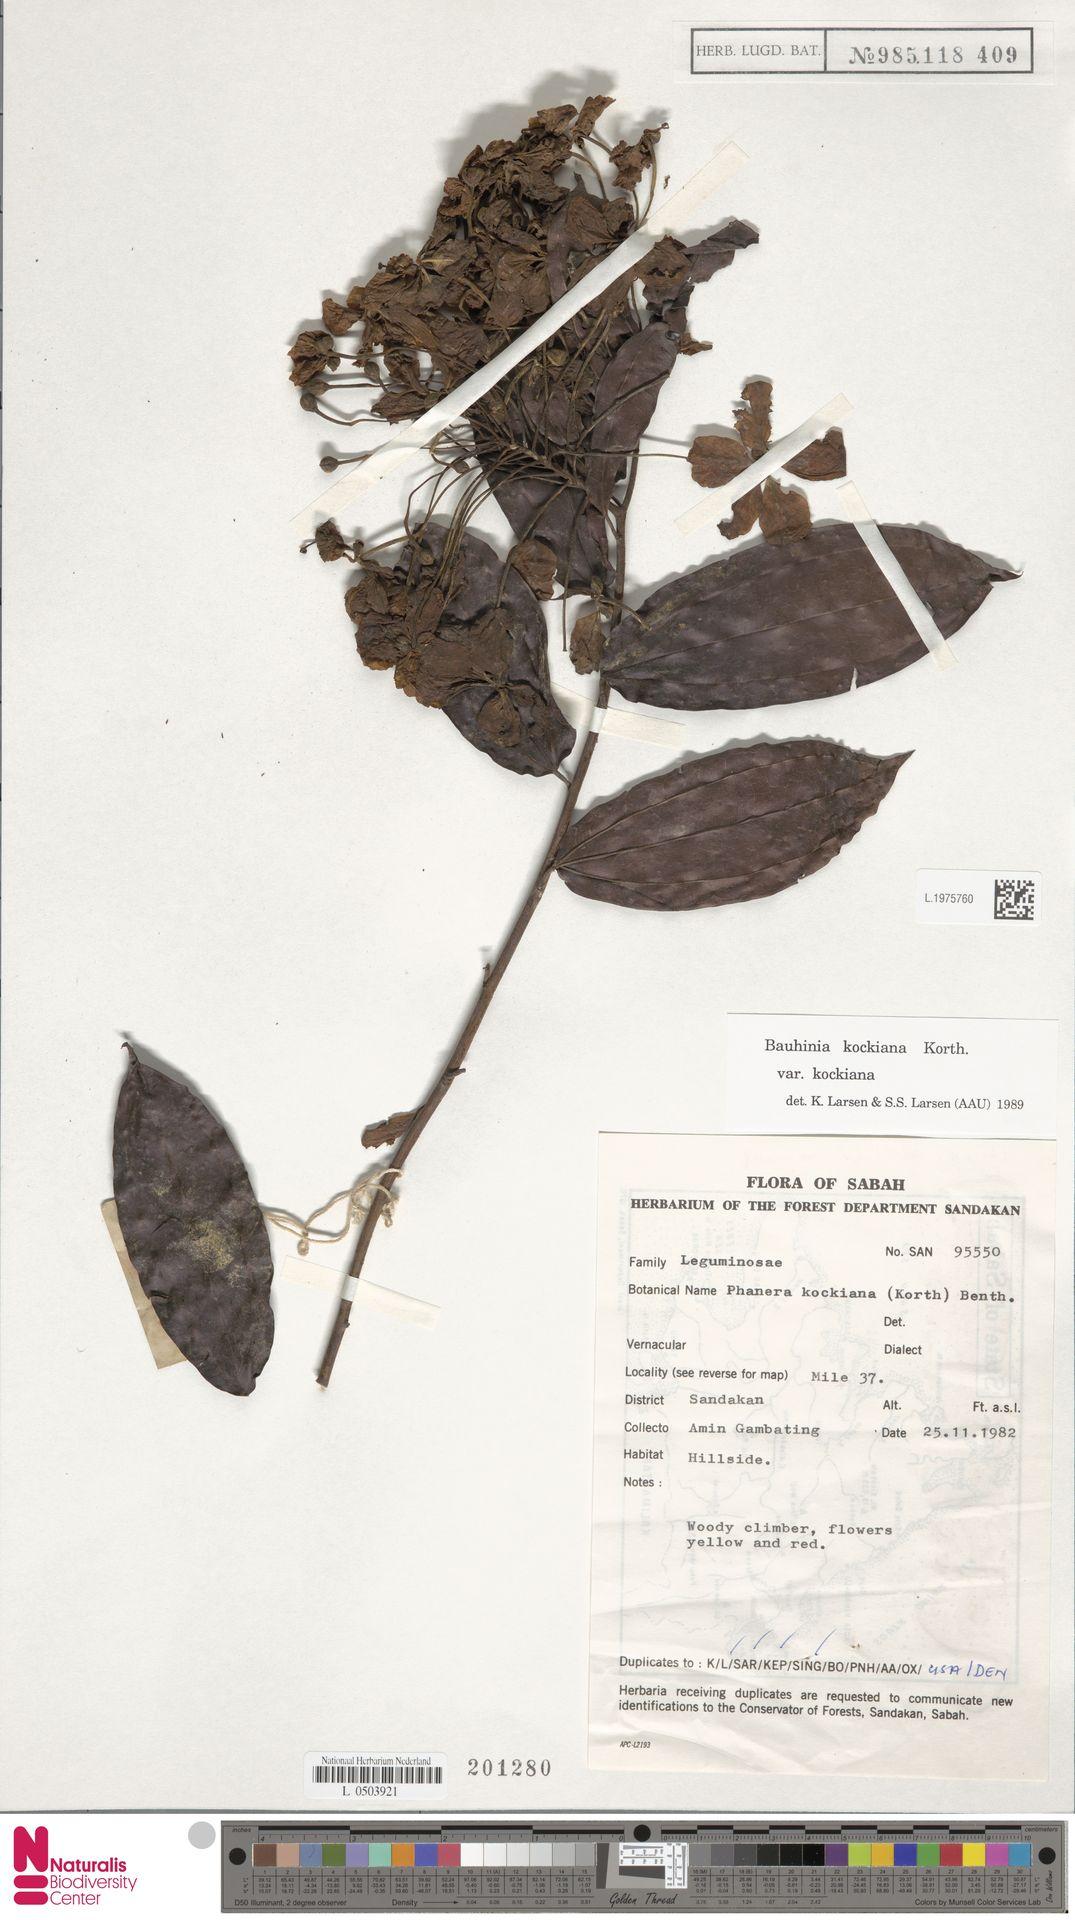 L.1975760 | Bauhinia kockiana var. kockiana